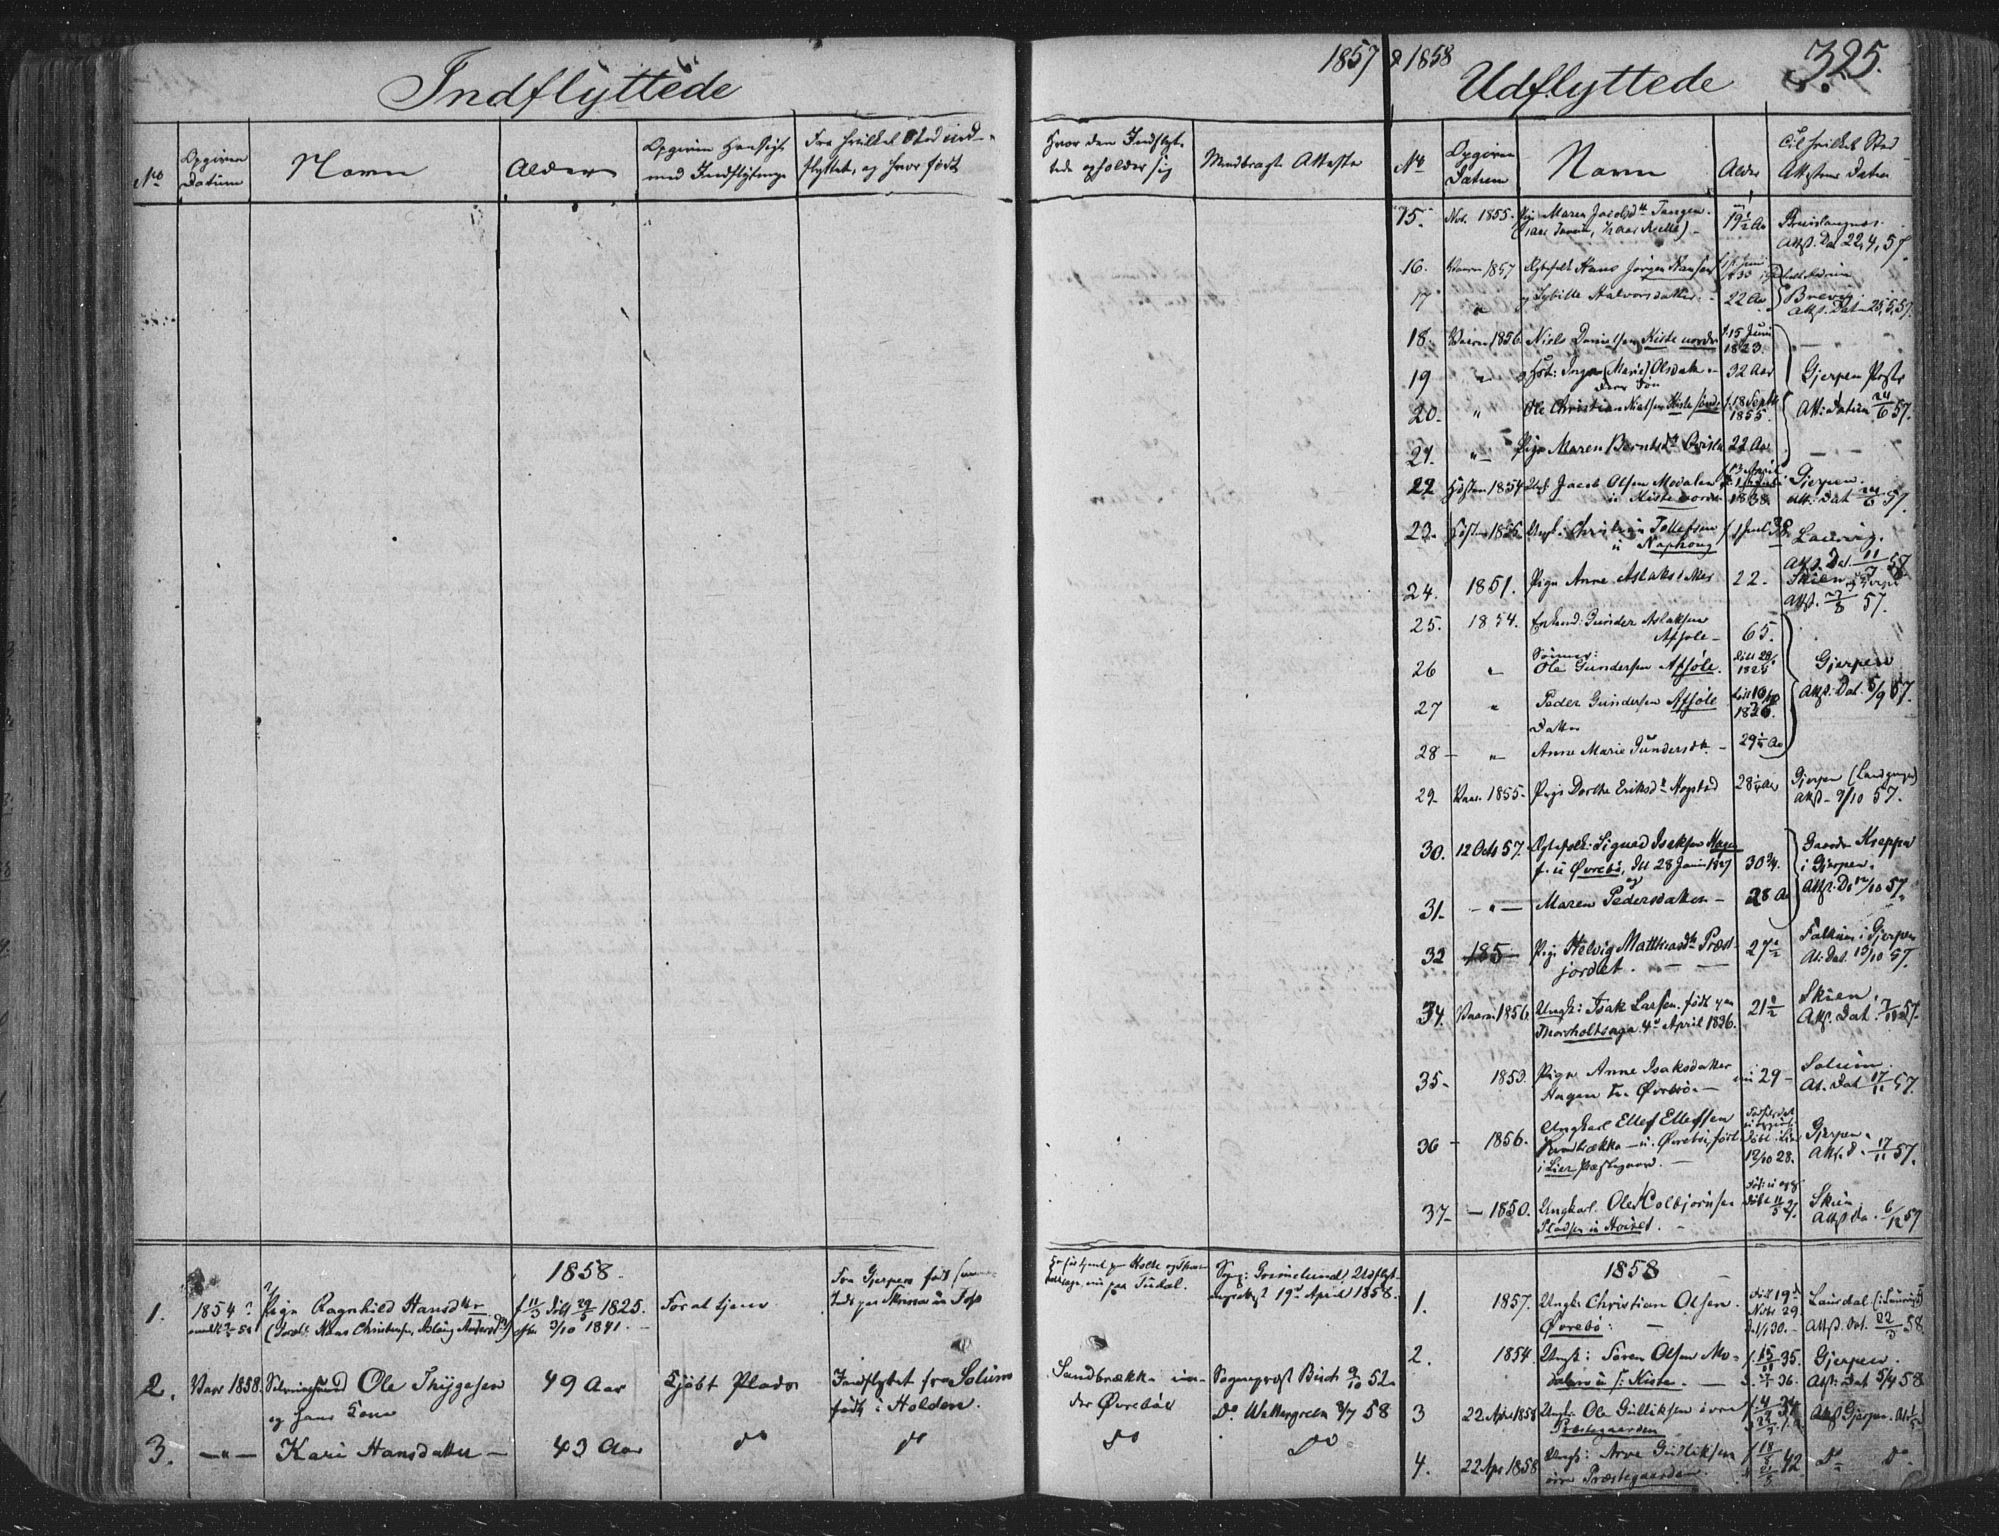 SAKO, Siljan kirkebøker, F/Fa/L0001: Parish register (official) no. 1, 1831-1870, p. 325